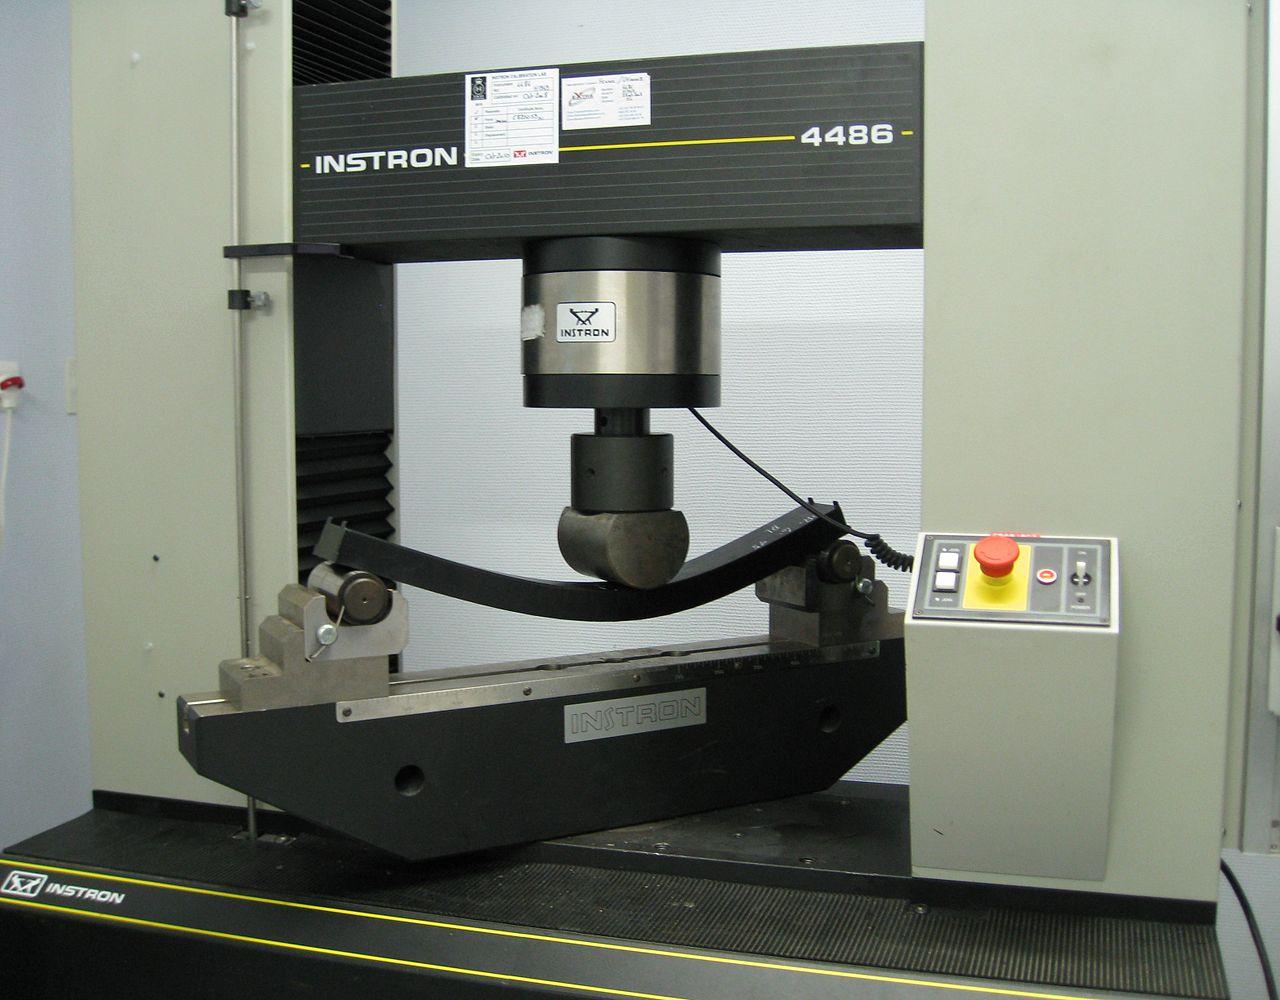 A Universal Testing Machine or UTM